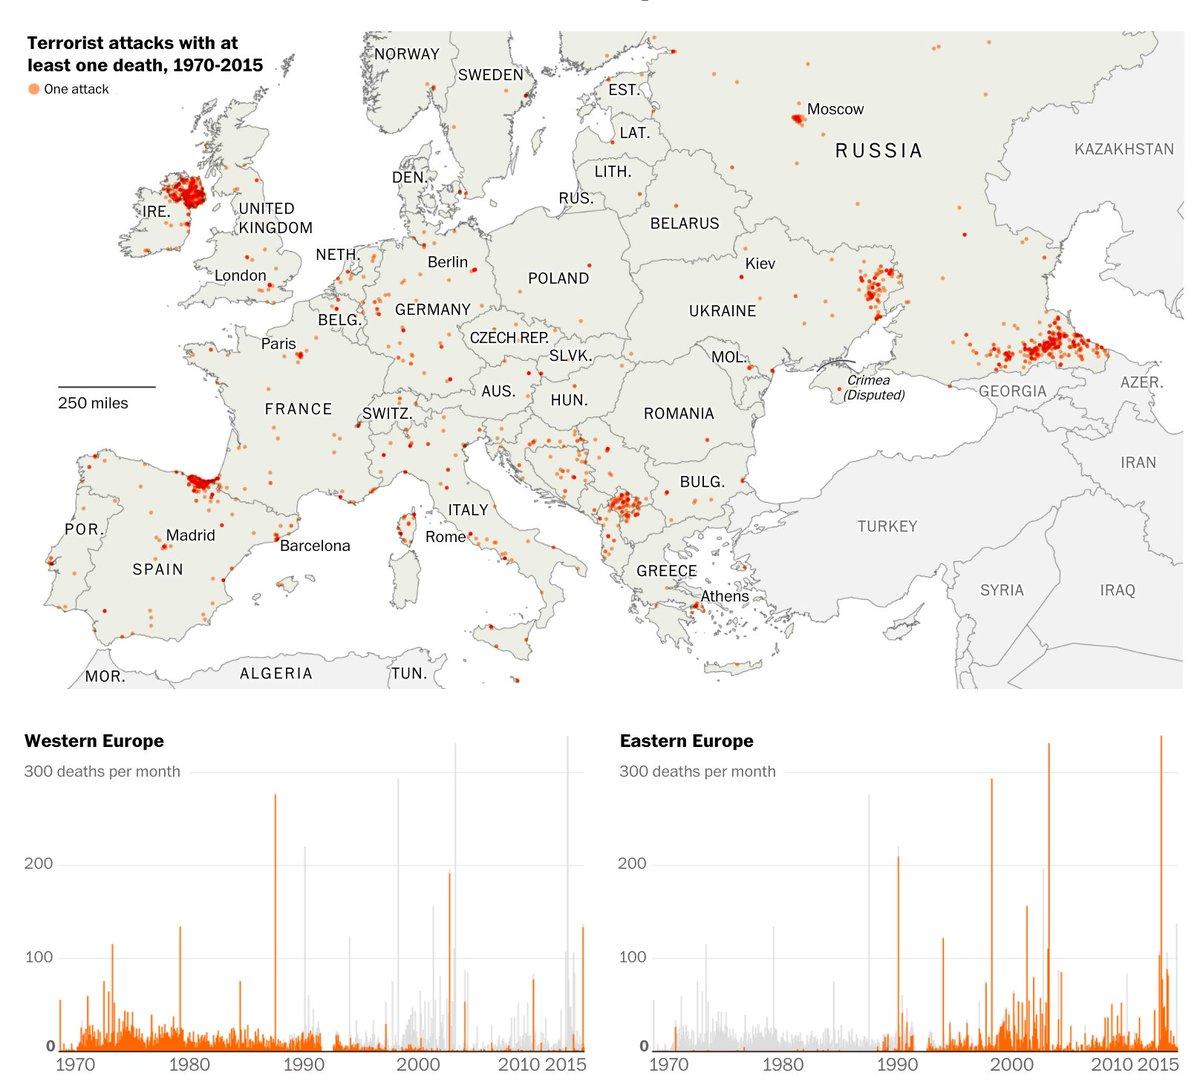 45 years of terrorist attacks in Europe, visualized @PostGraphics:  https://www. washingtonpost.com/graphics/world /a-history-of-terrorism-in-europe/?tid=ss_tw &nbsp; …  #dataviz #infographics <br>http://pic.twitter.com/CdSVGVZjCV